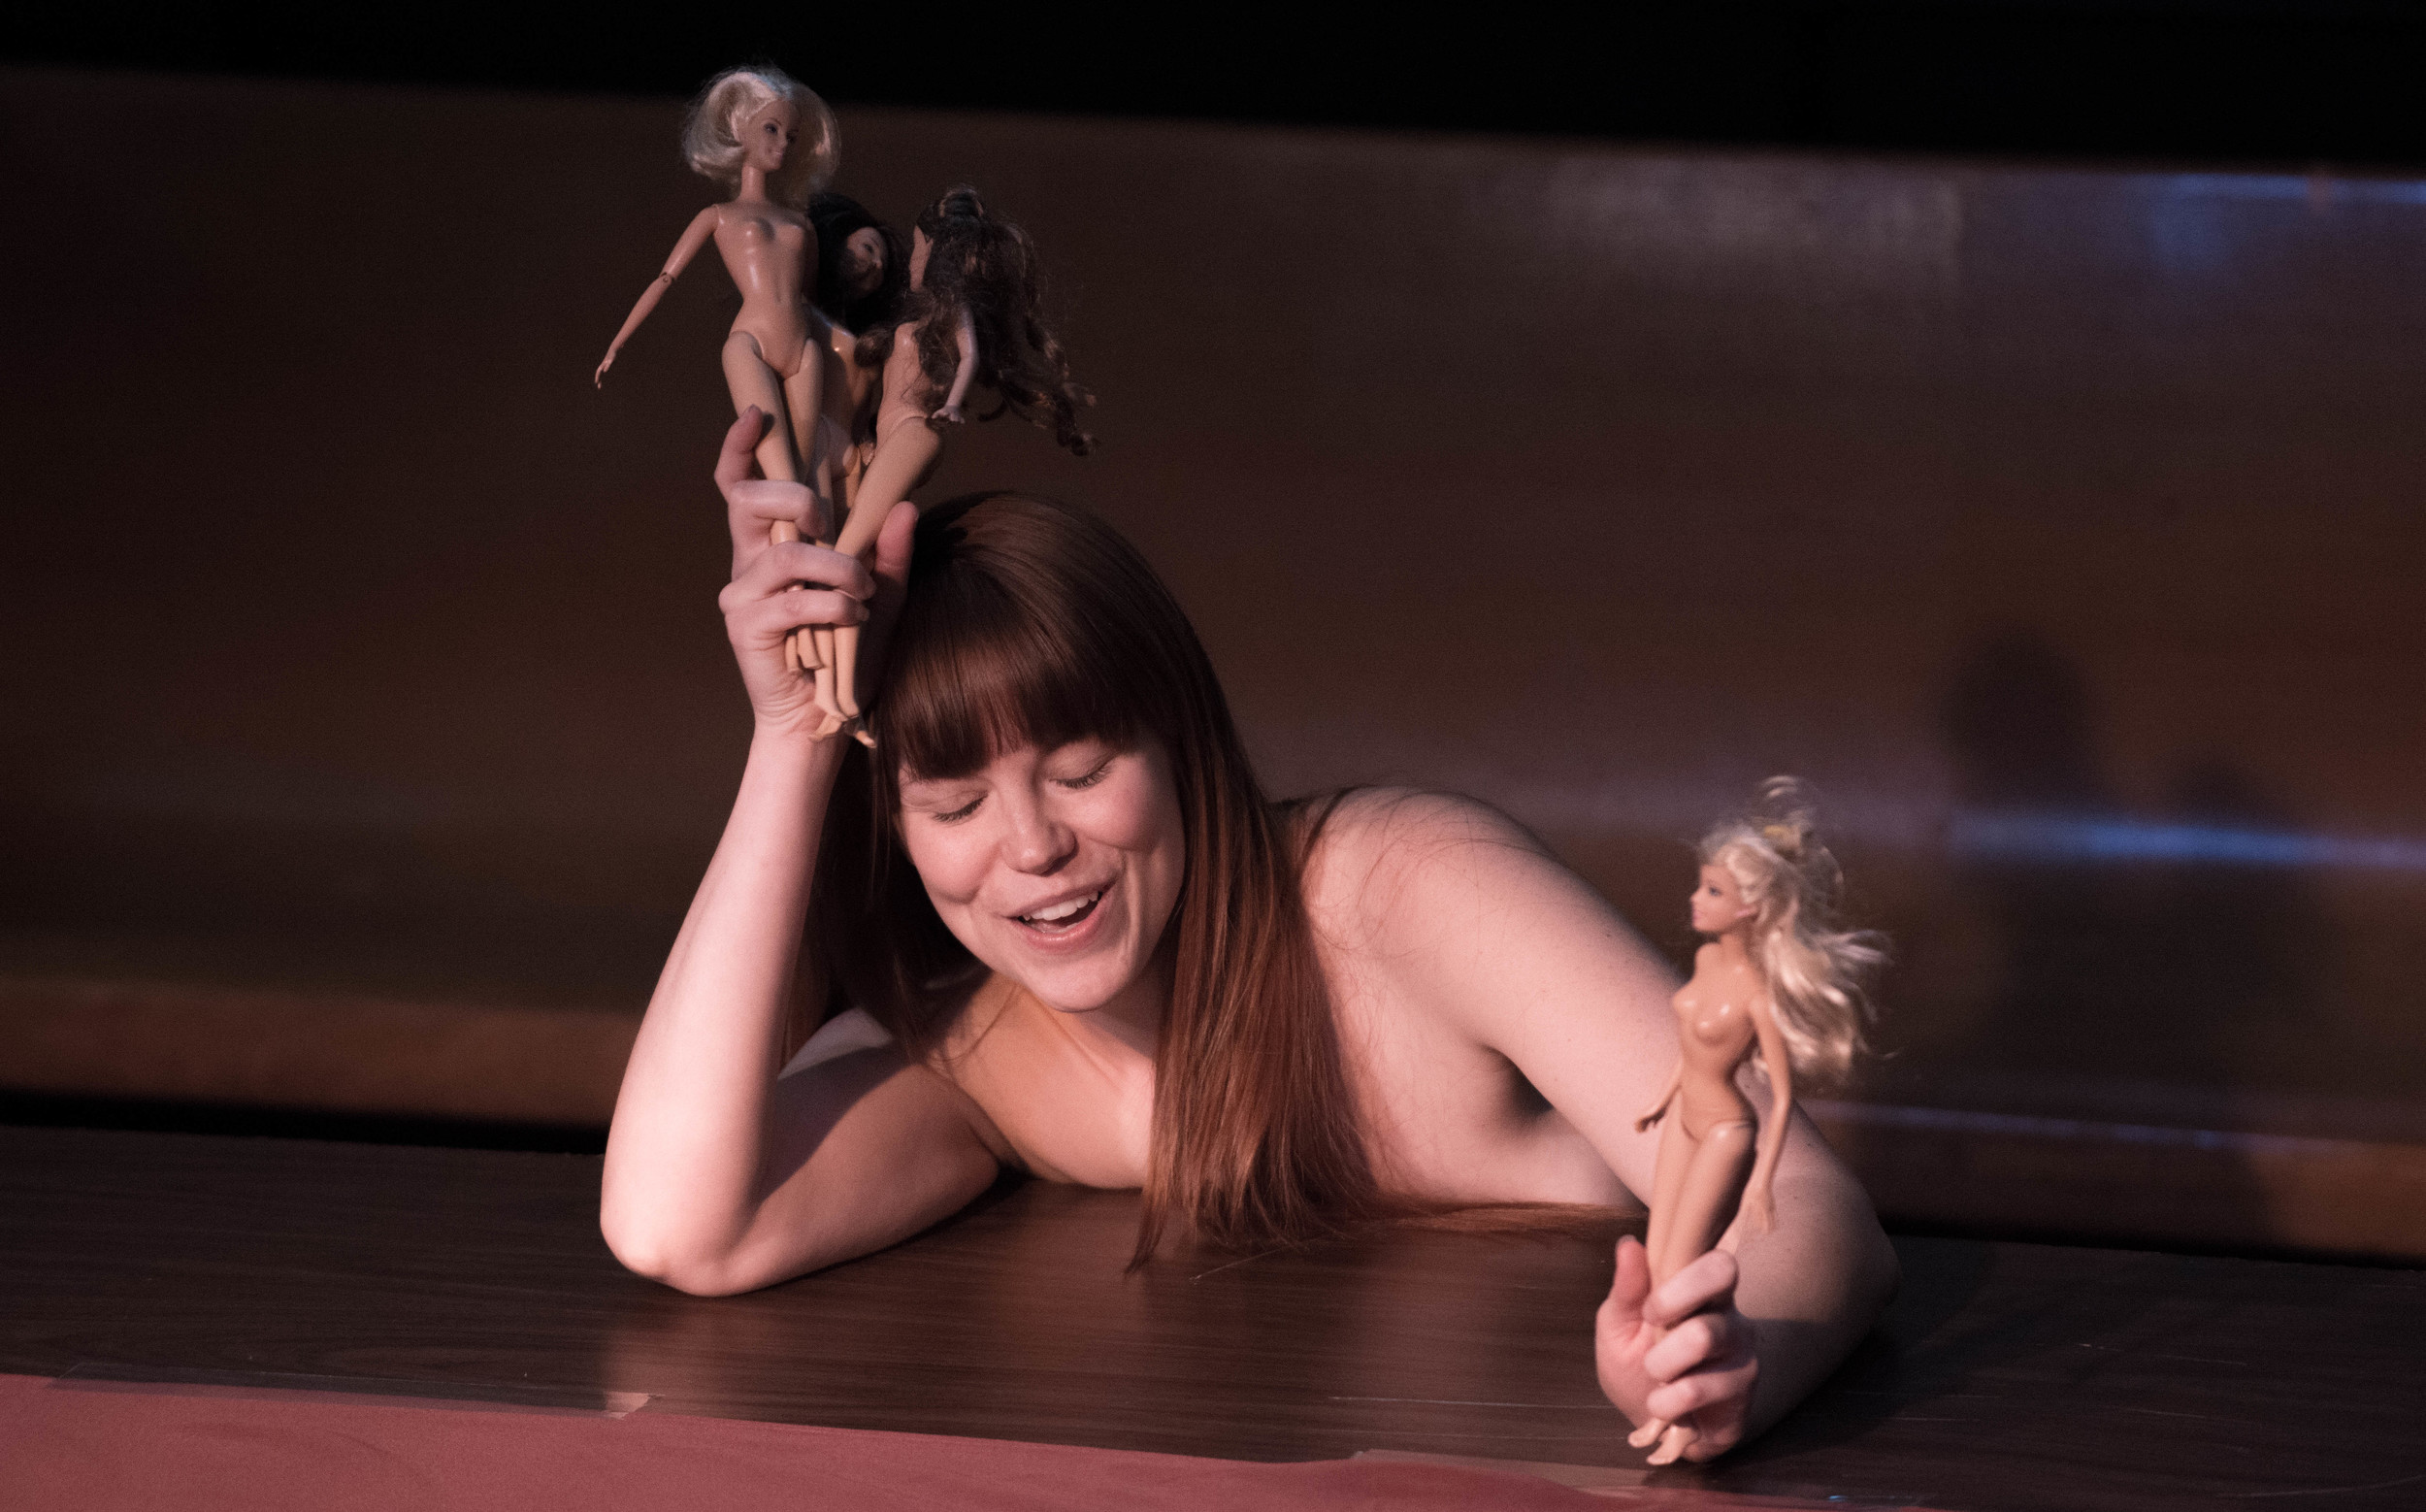 NakedLadies-6.jpg